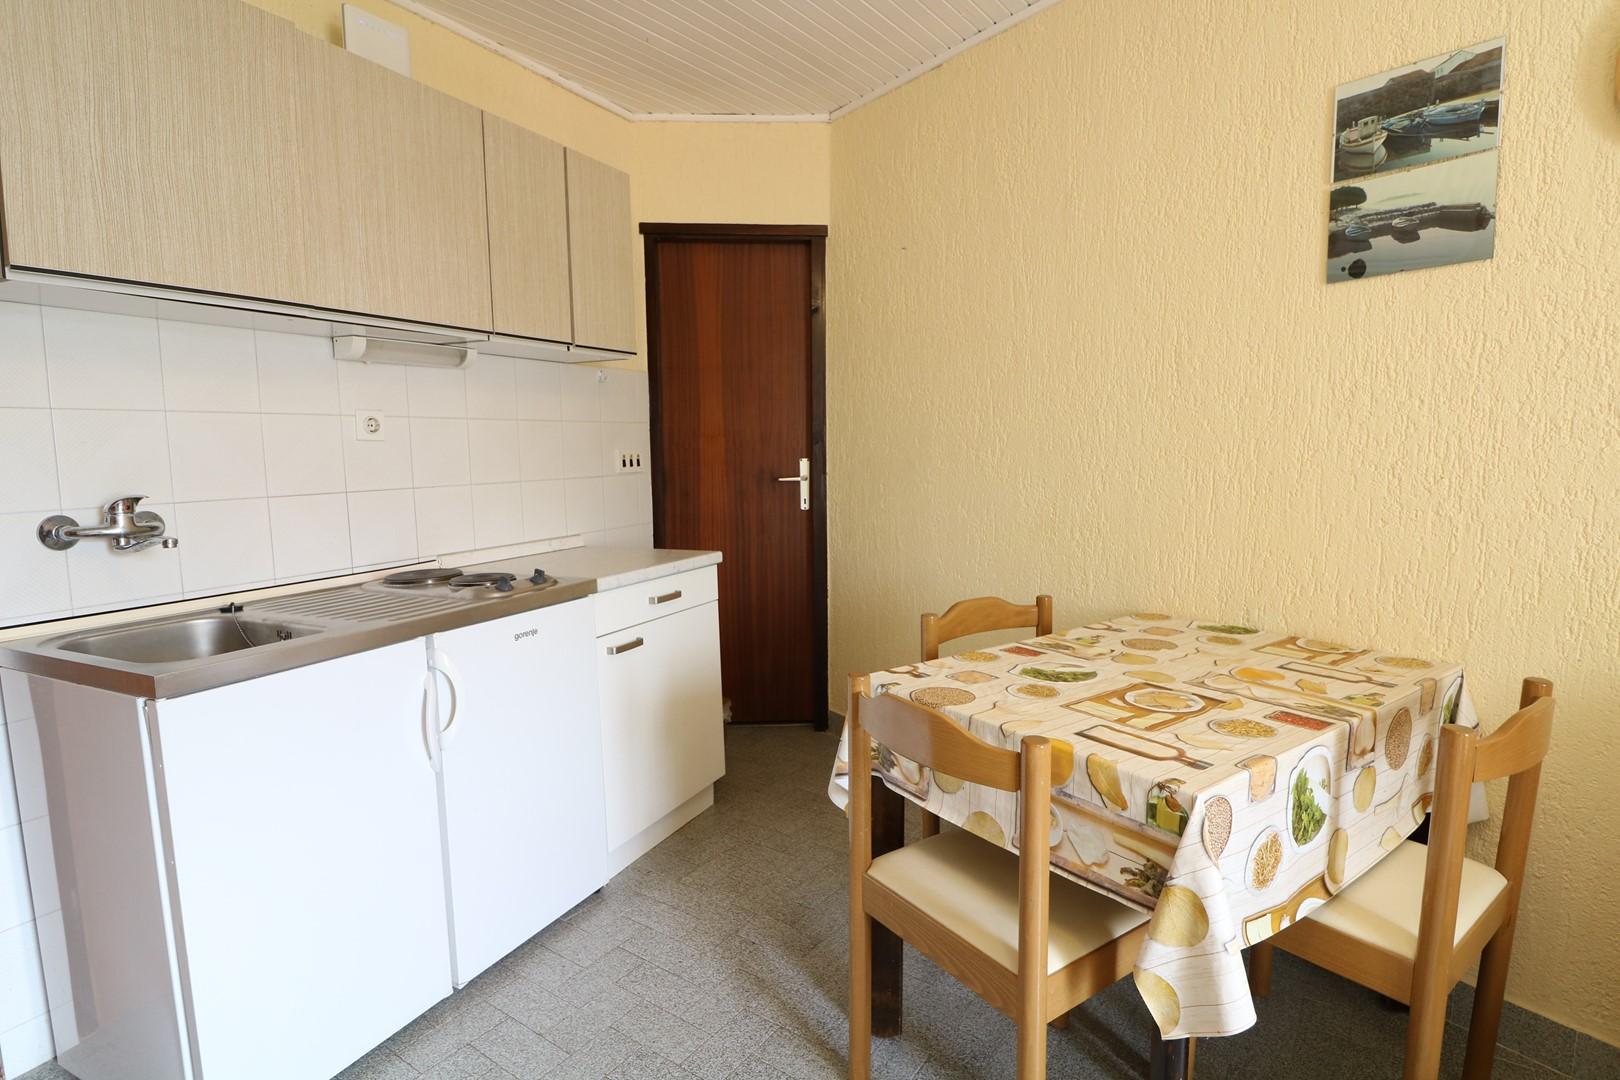 Ferienwohnung Apartments Ivo with the Sea View / Apartment Ivo with Beautiful Sea View (2616230), Baška, Insel Krk, Kvarner, Kroatien, Bild 19